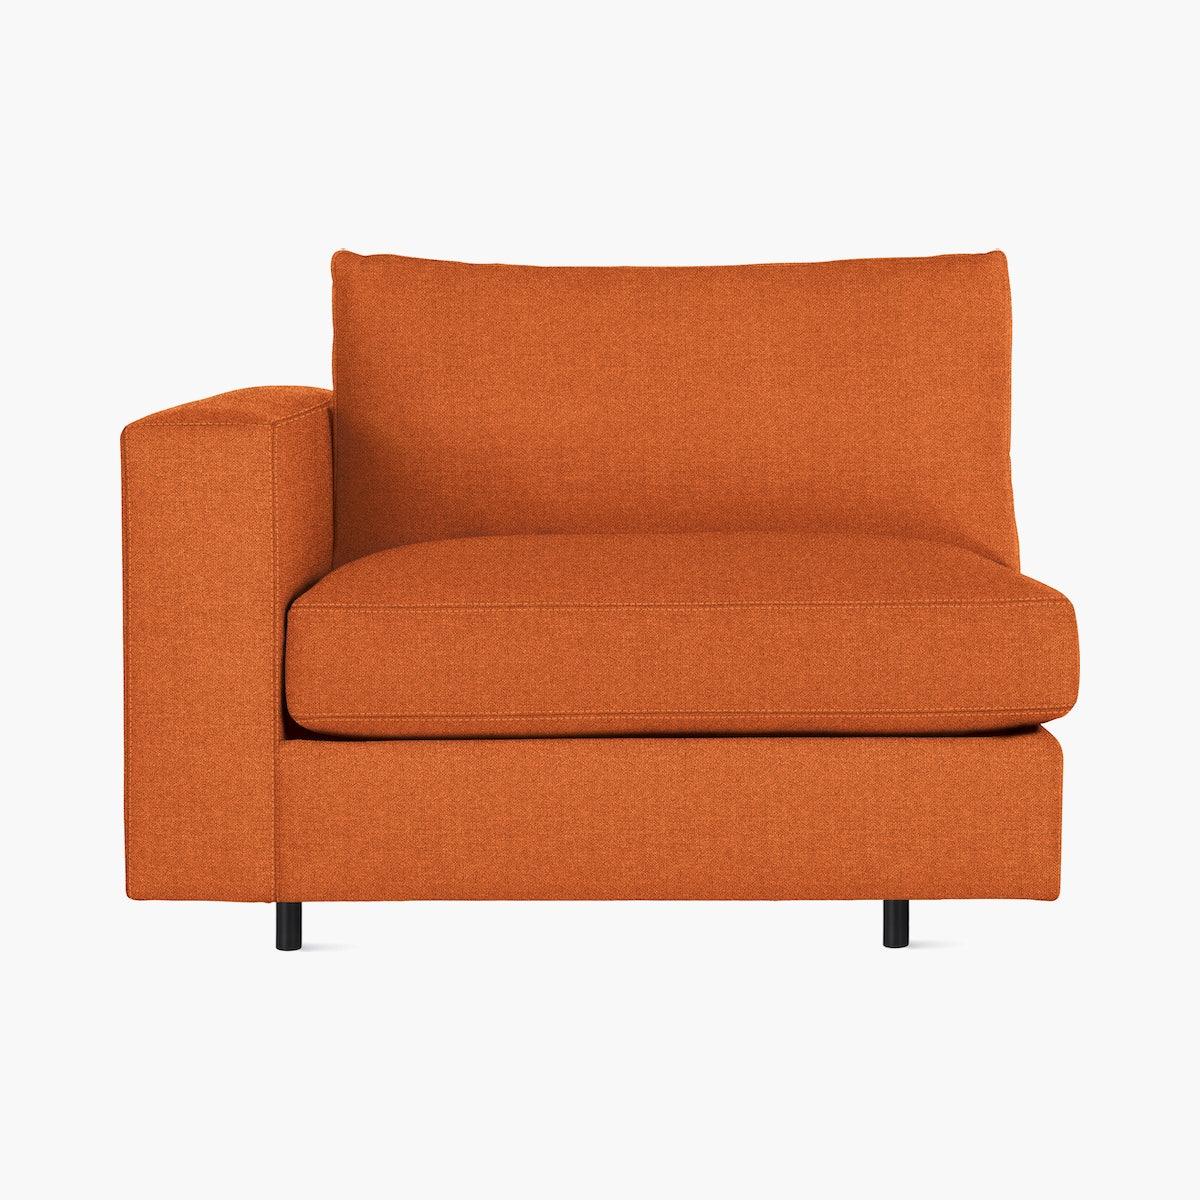 Reid Chair